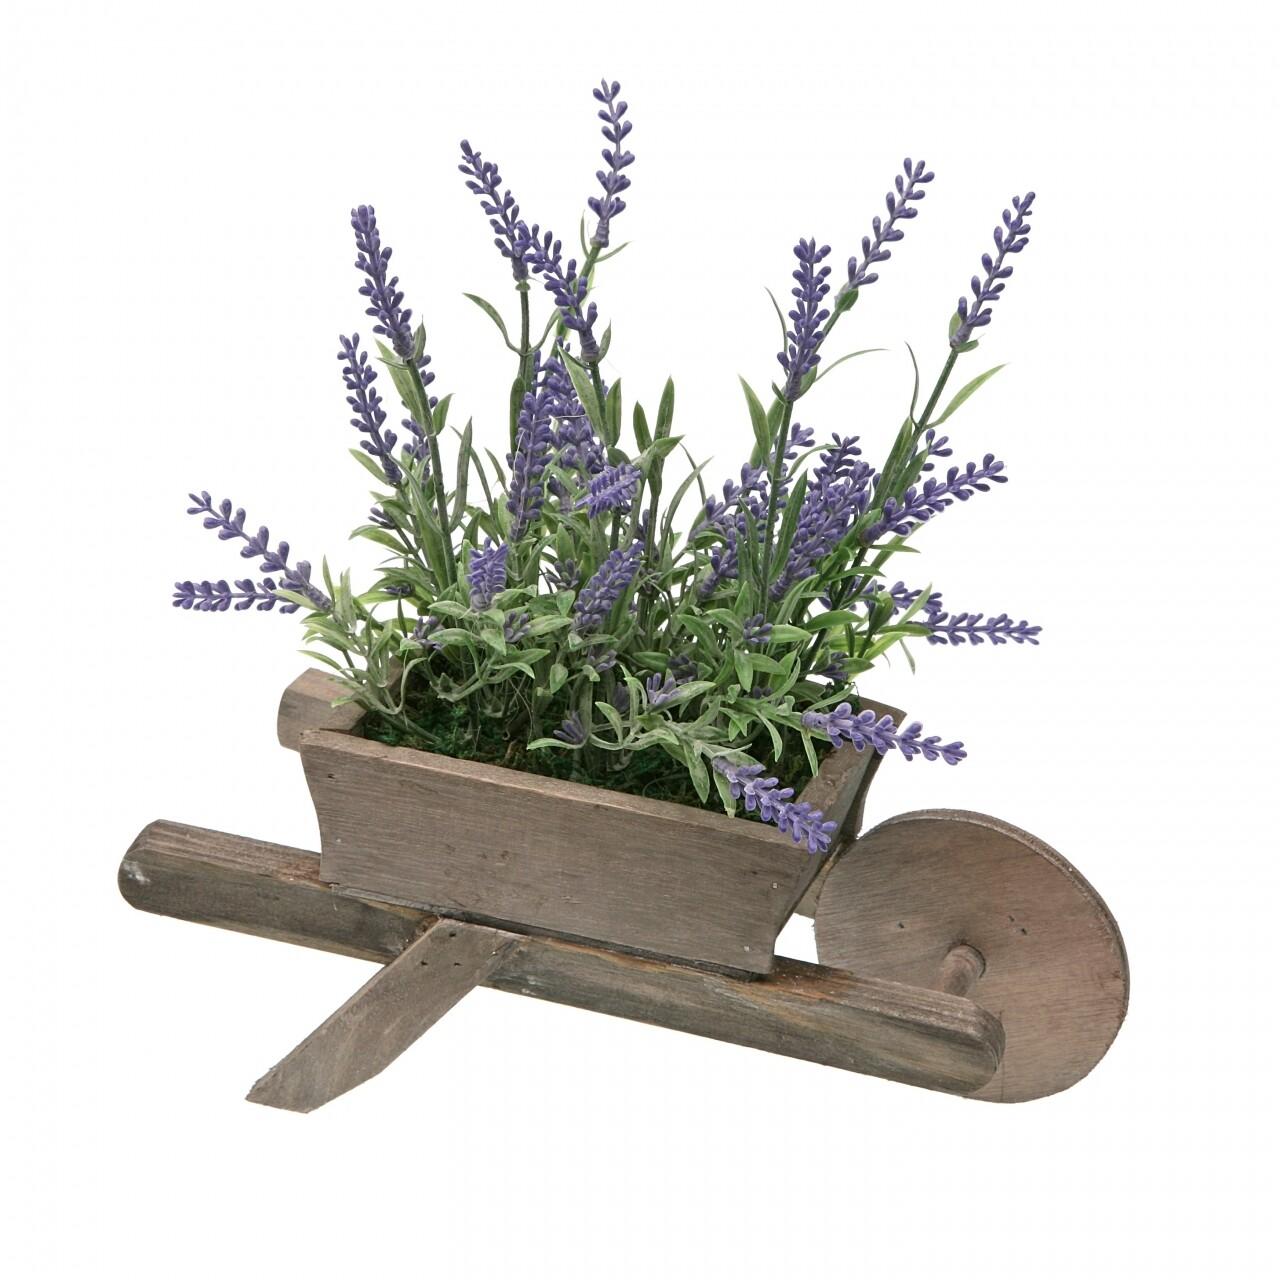 Decoratiune cu planta artificiala Lavender, 26 x 28 cm, metal